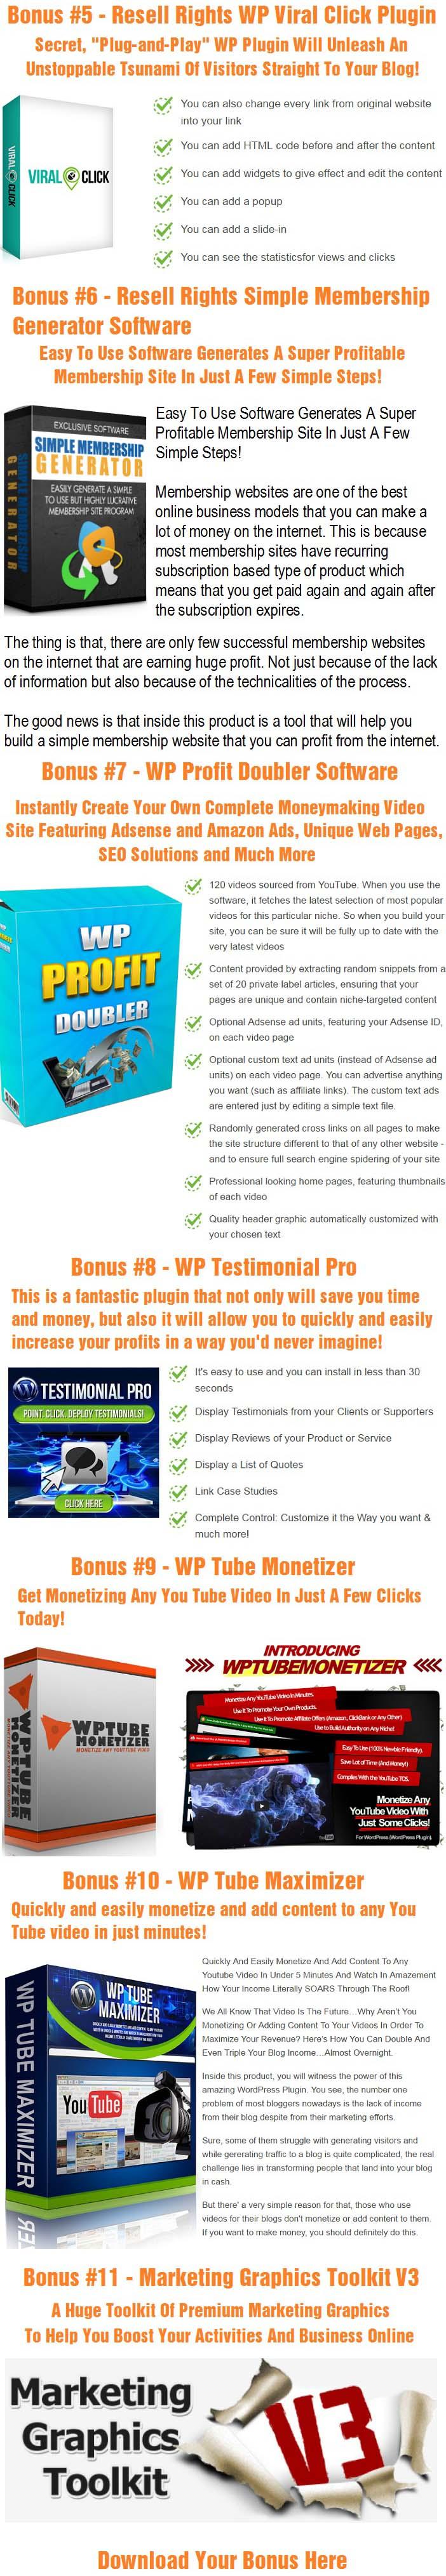 BleuPage Pro Bonus